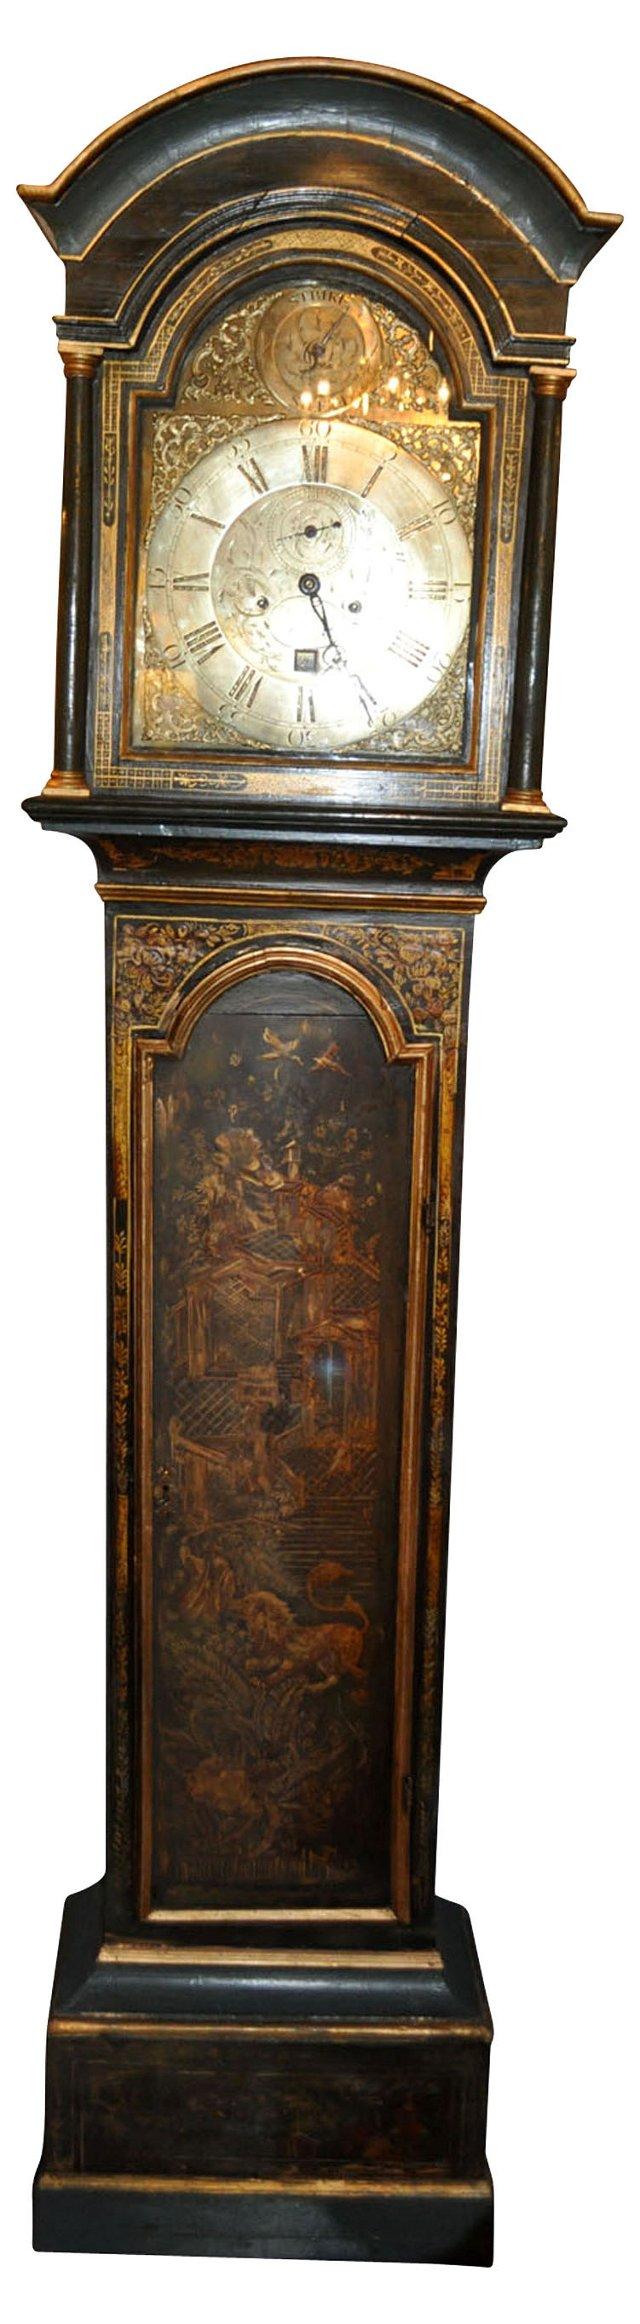 19th-C. Chinoiserie Tall Case Clock